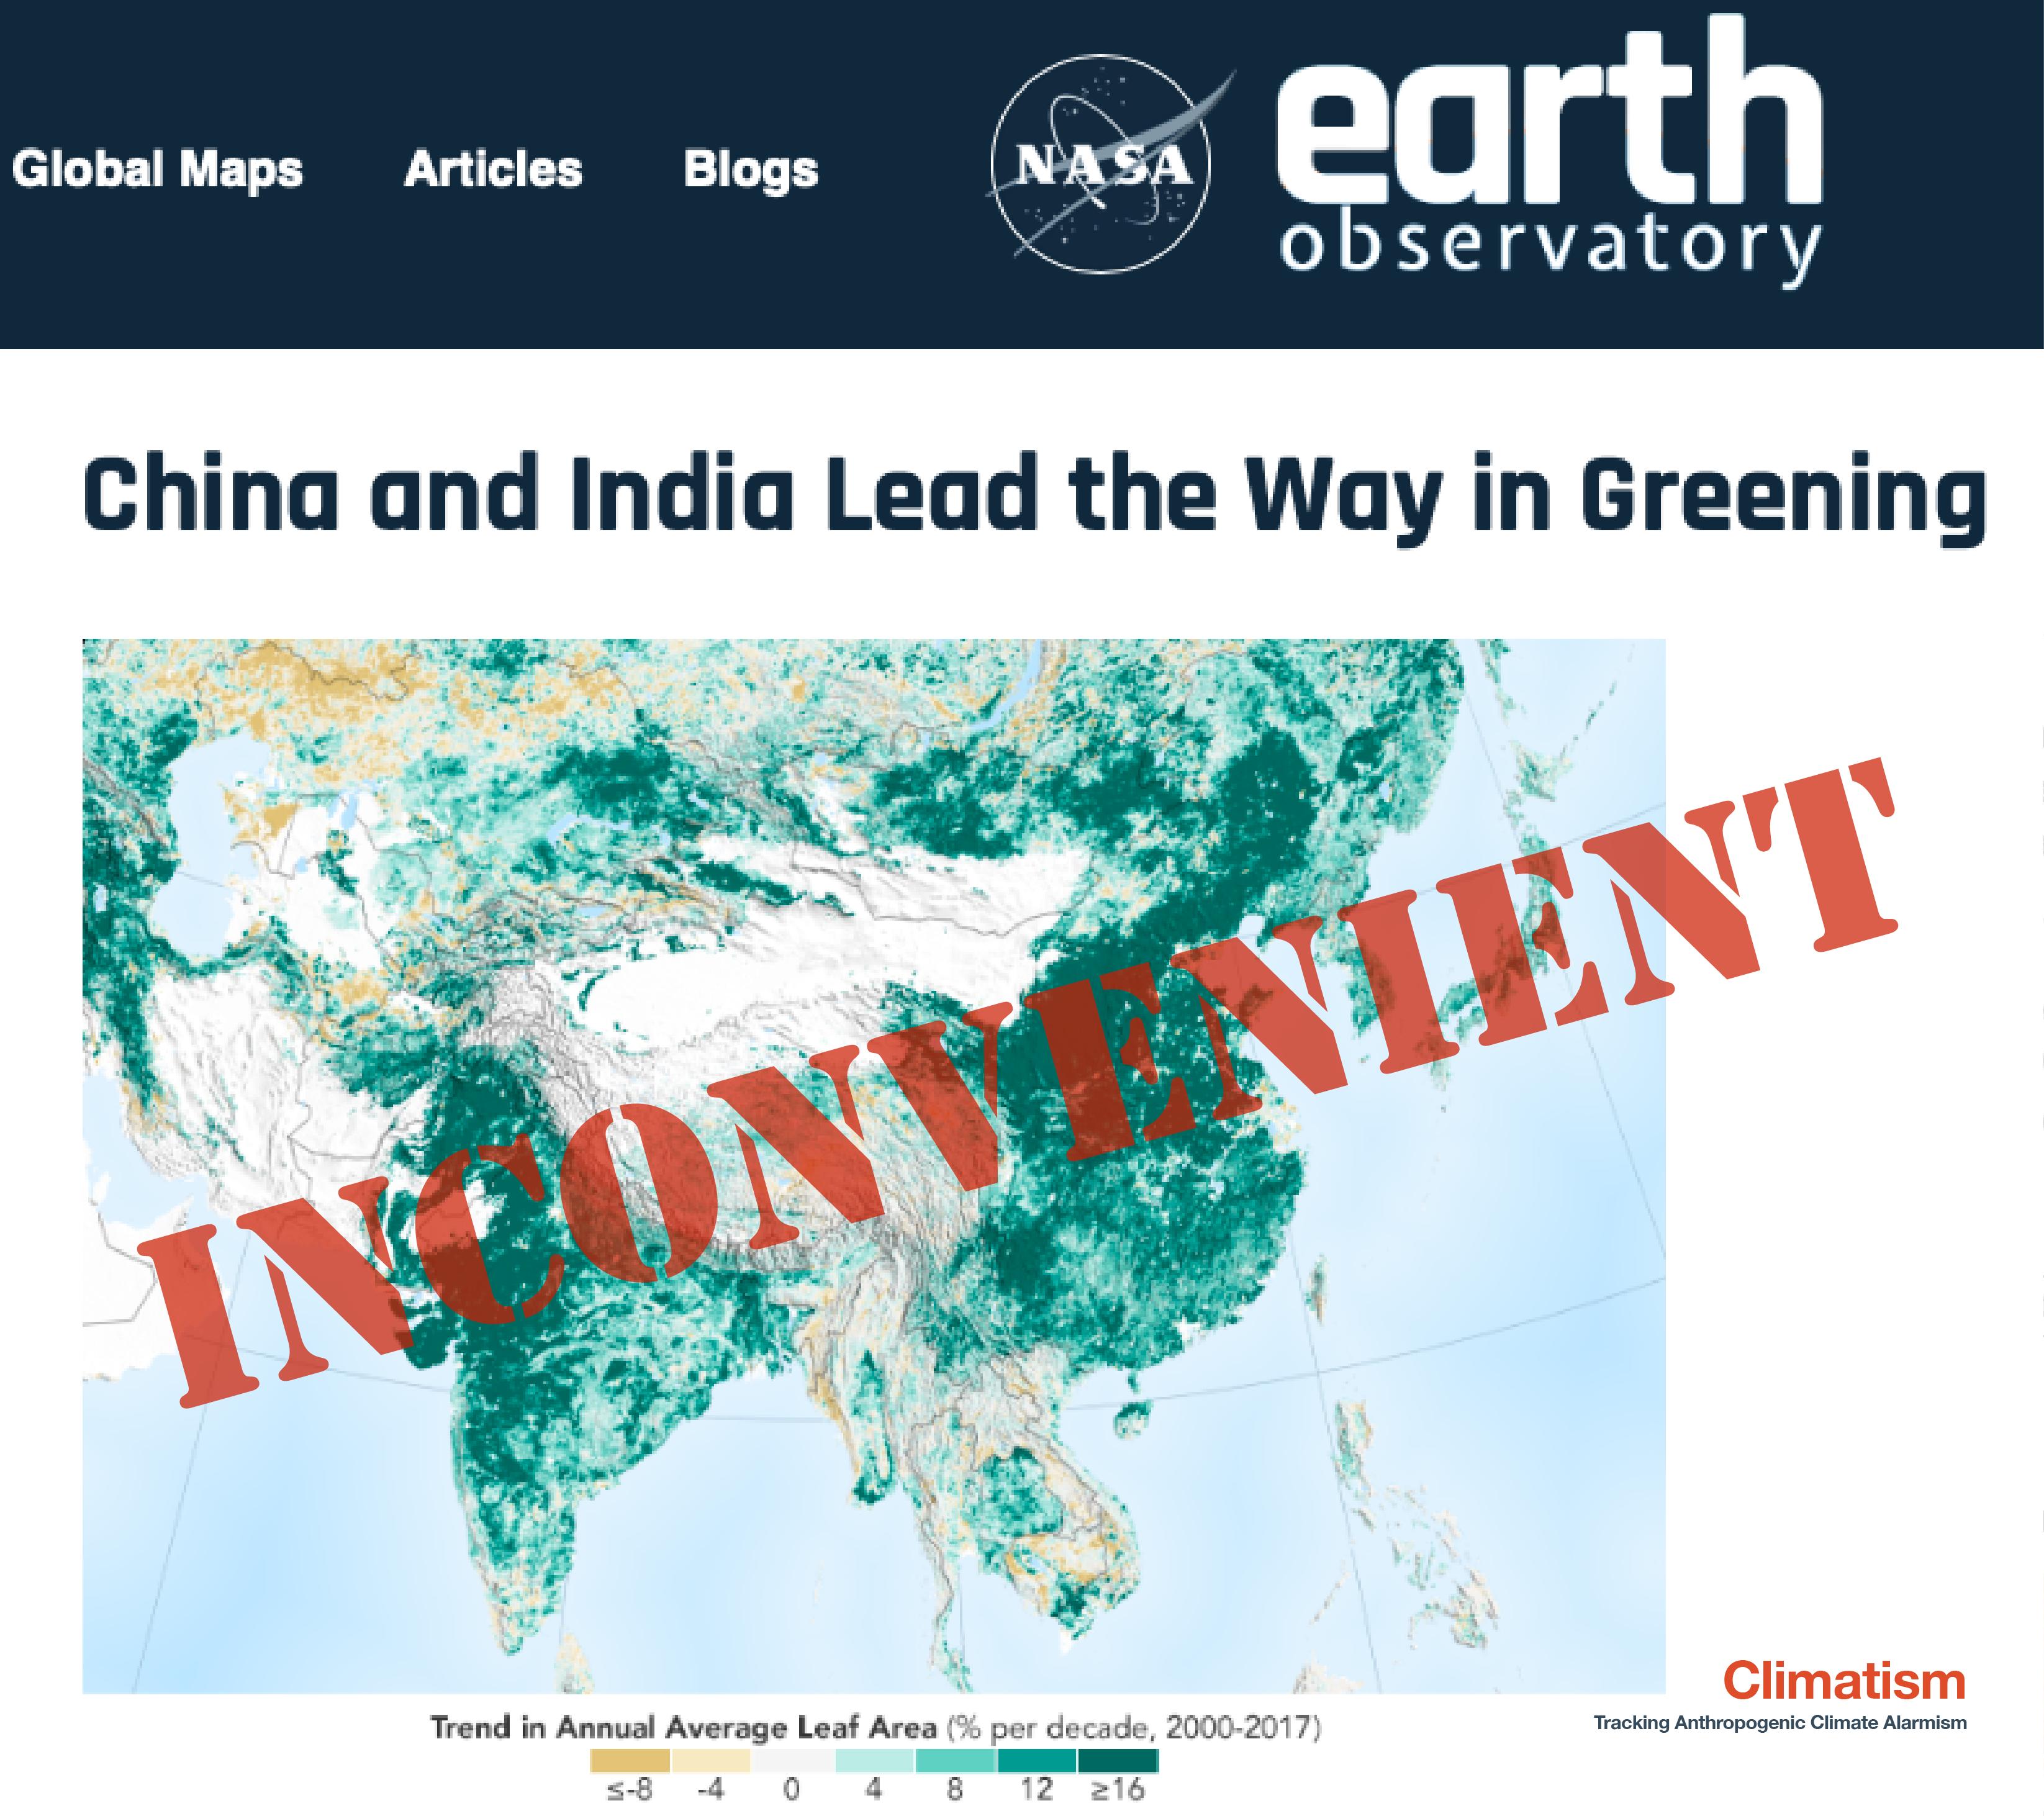 China and India Lead the Way in Greening | NASA - CIMATISM